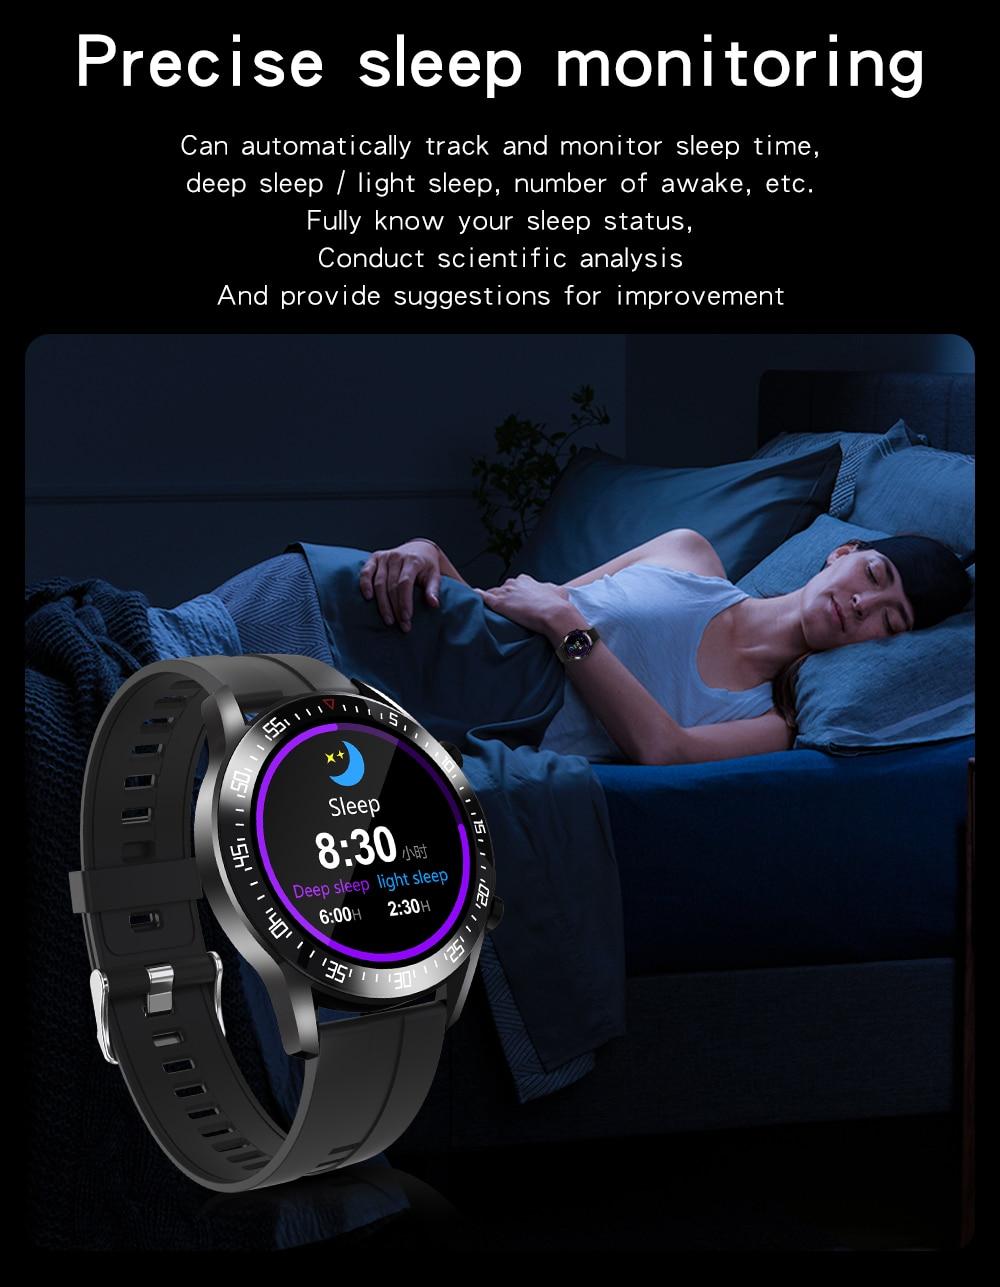 H005810fb23d2469997385b927ae6df78u XUESEVEN 2021 HD Full circle touch screen Mens Smart Watches IP68 Waterproof Sports Fitness Watch Fashion Smart Watch for men